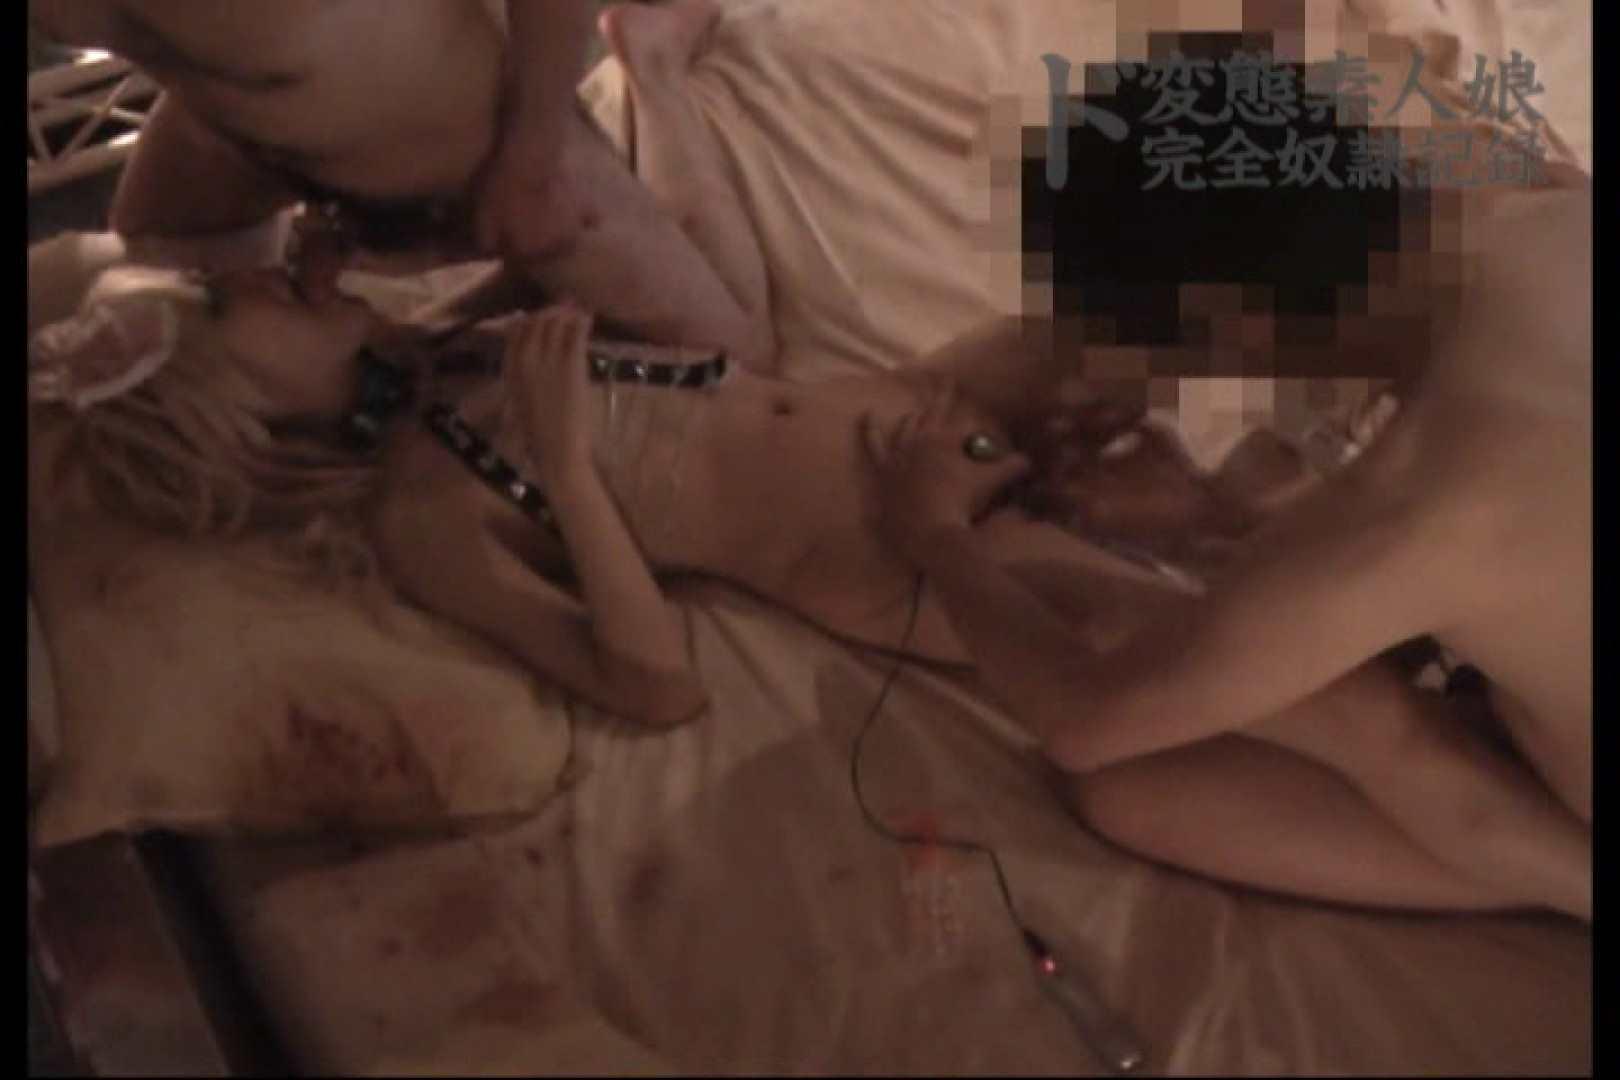 ド変態素人嬢完全奴隷記録 ~其の漆~参 3P AV無料 62連発 24